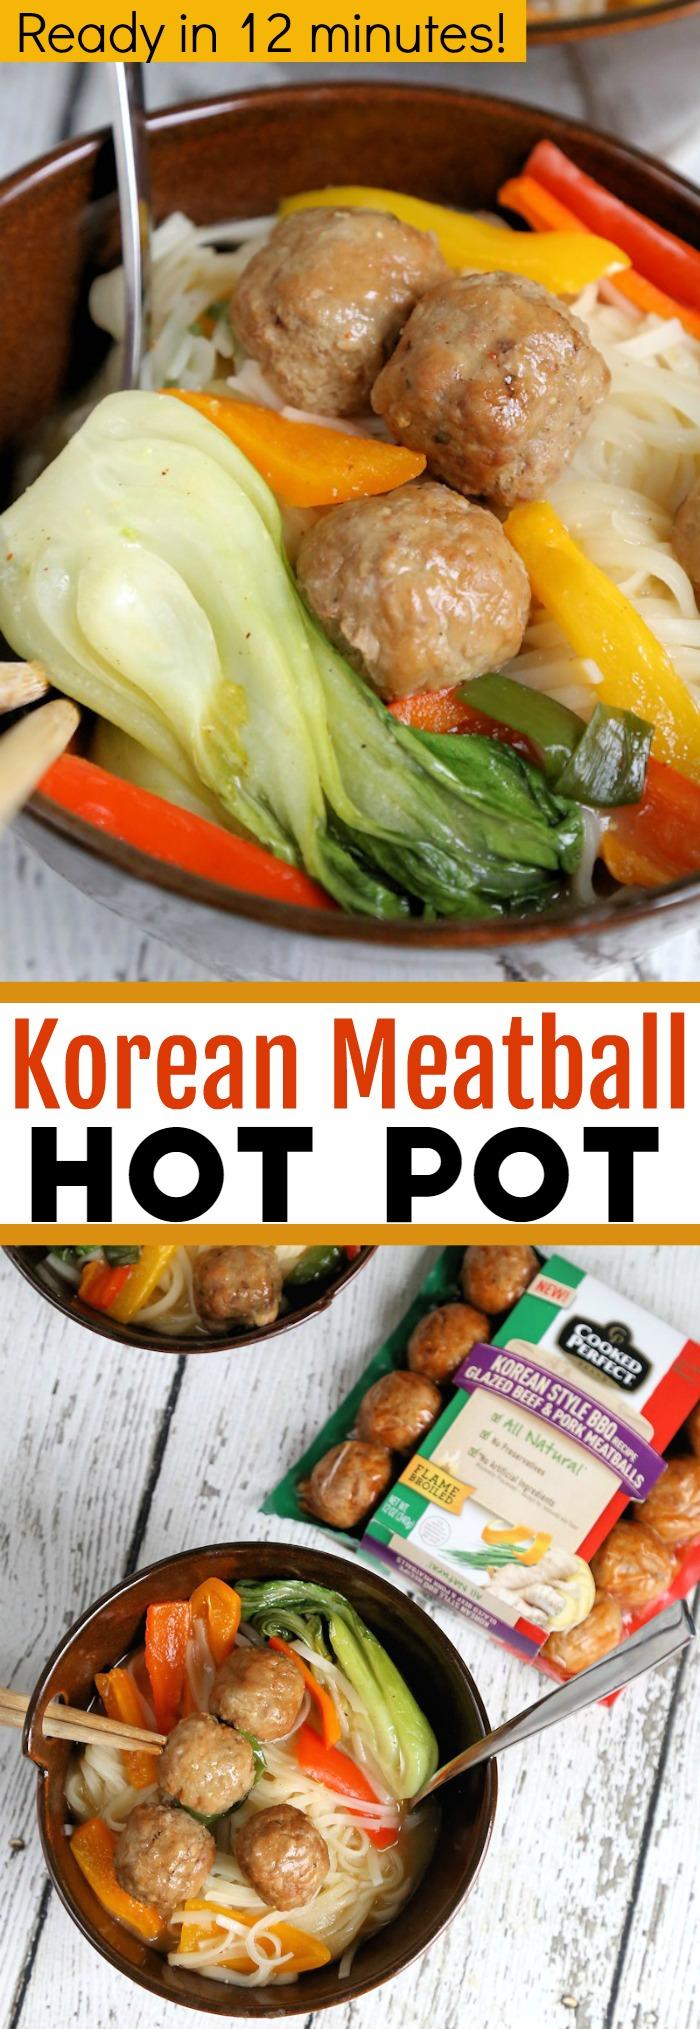 Korean Meatball Hot Pot - easy recipe ready in 12 minutes